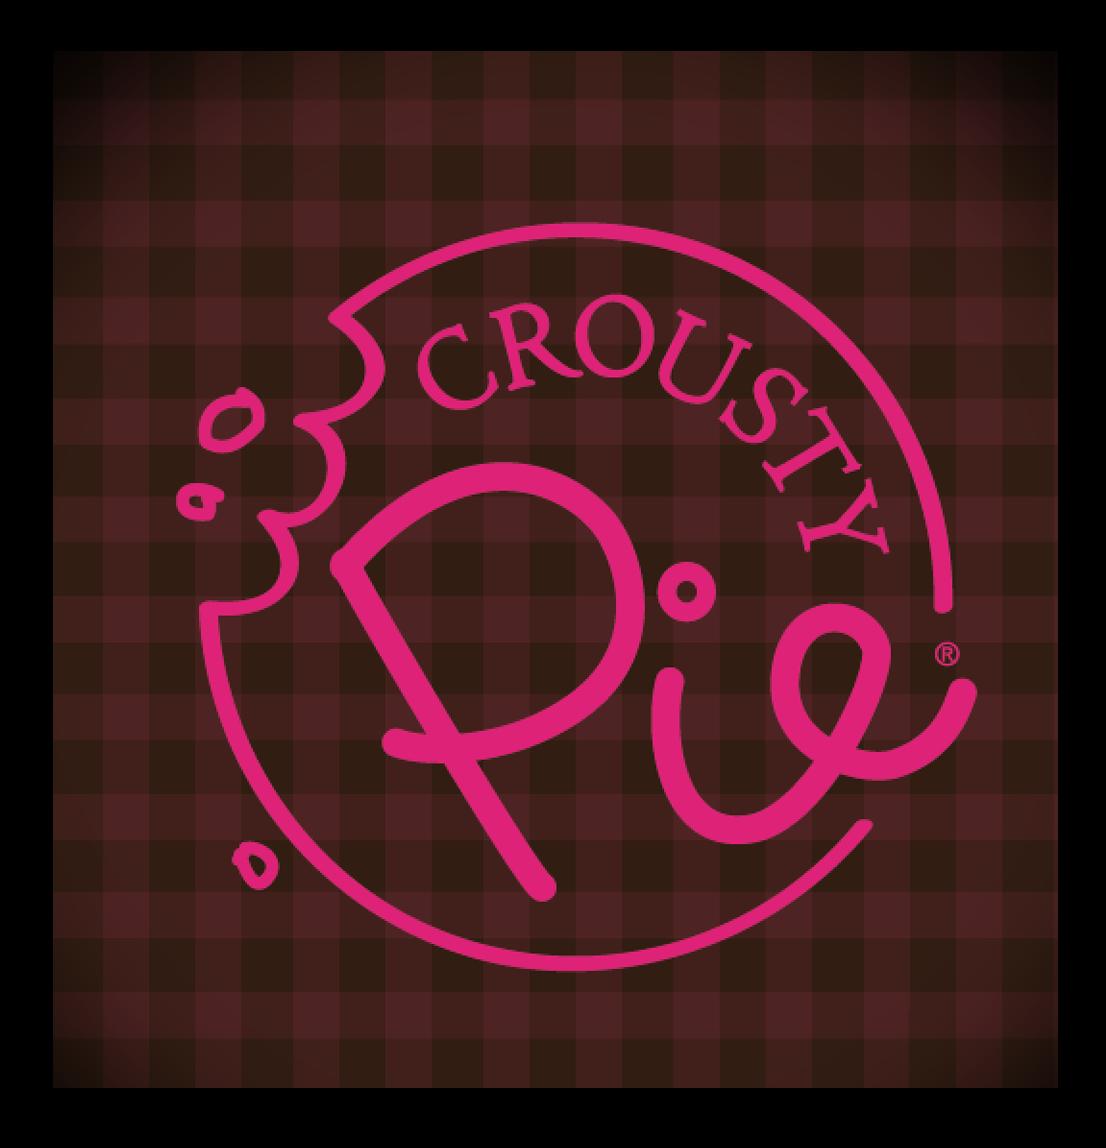 Crousty Pie